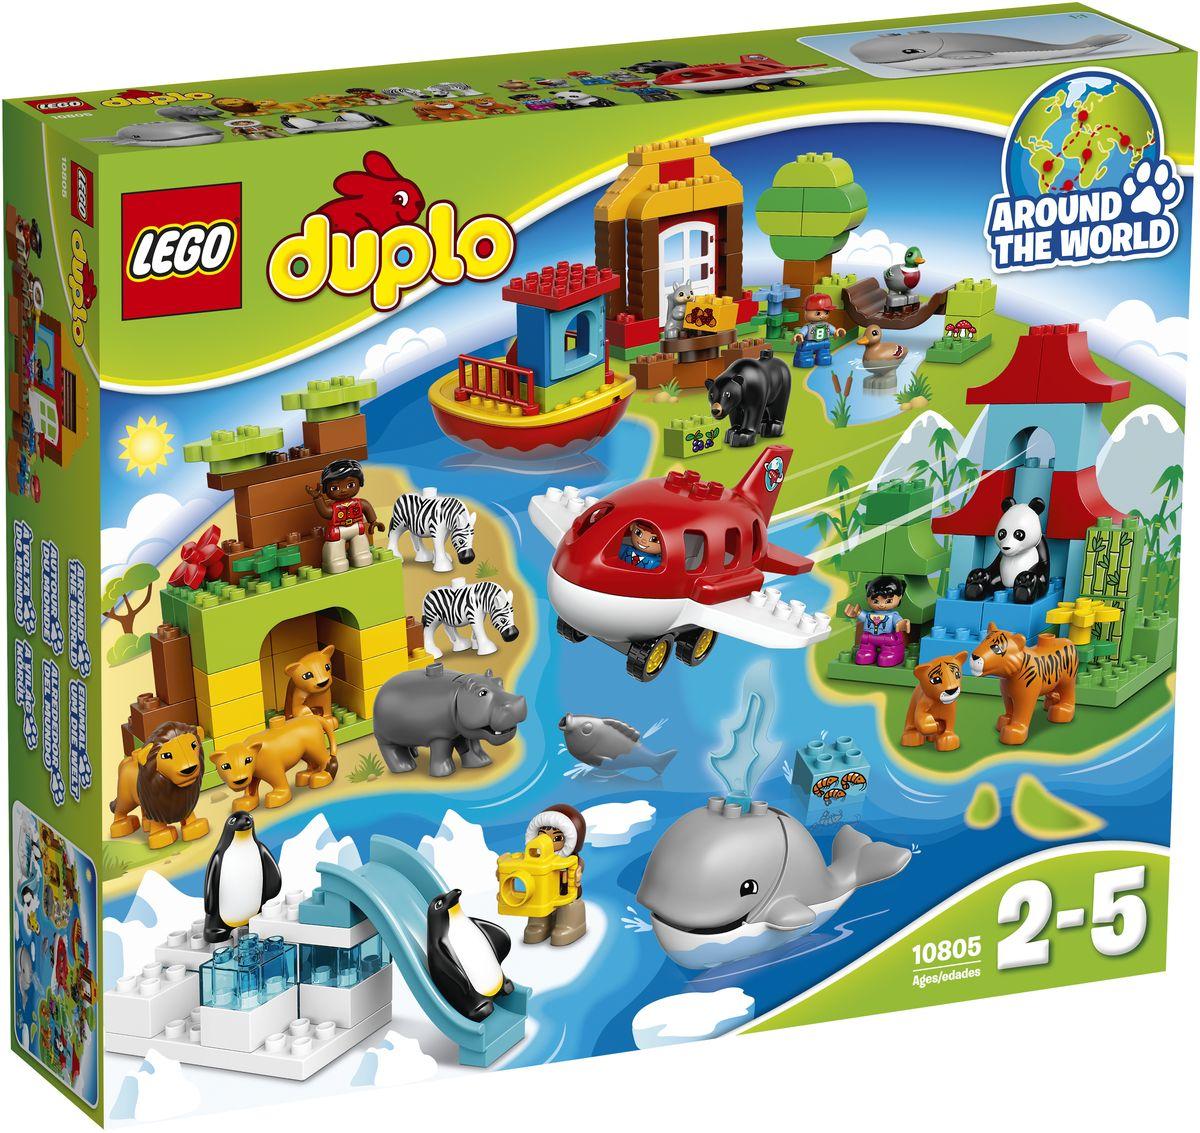 LEGO DUPLO 10805 Вокруг света Конструктор цена